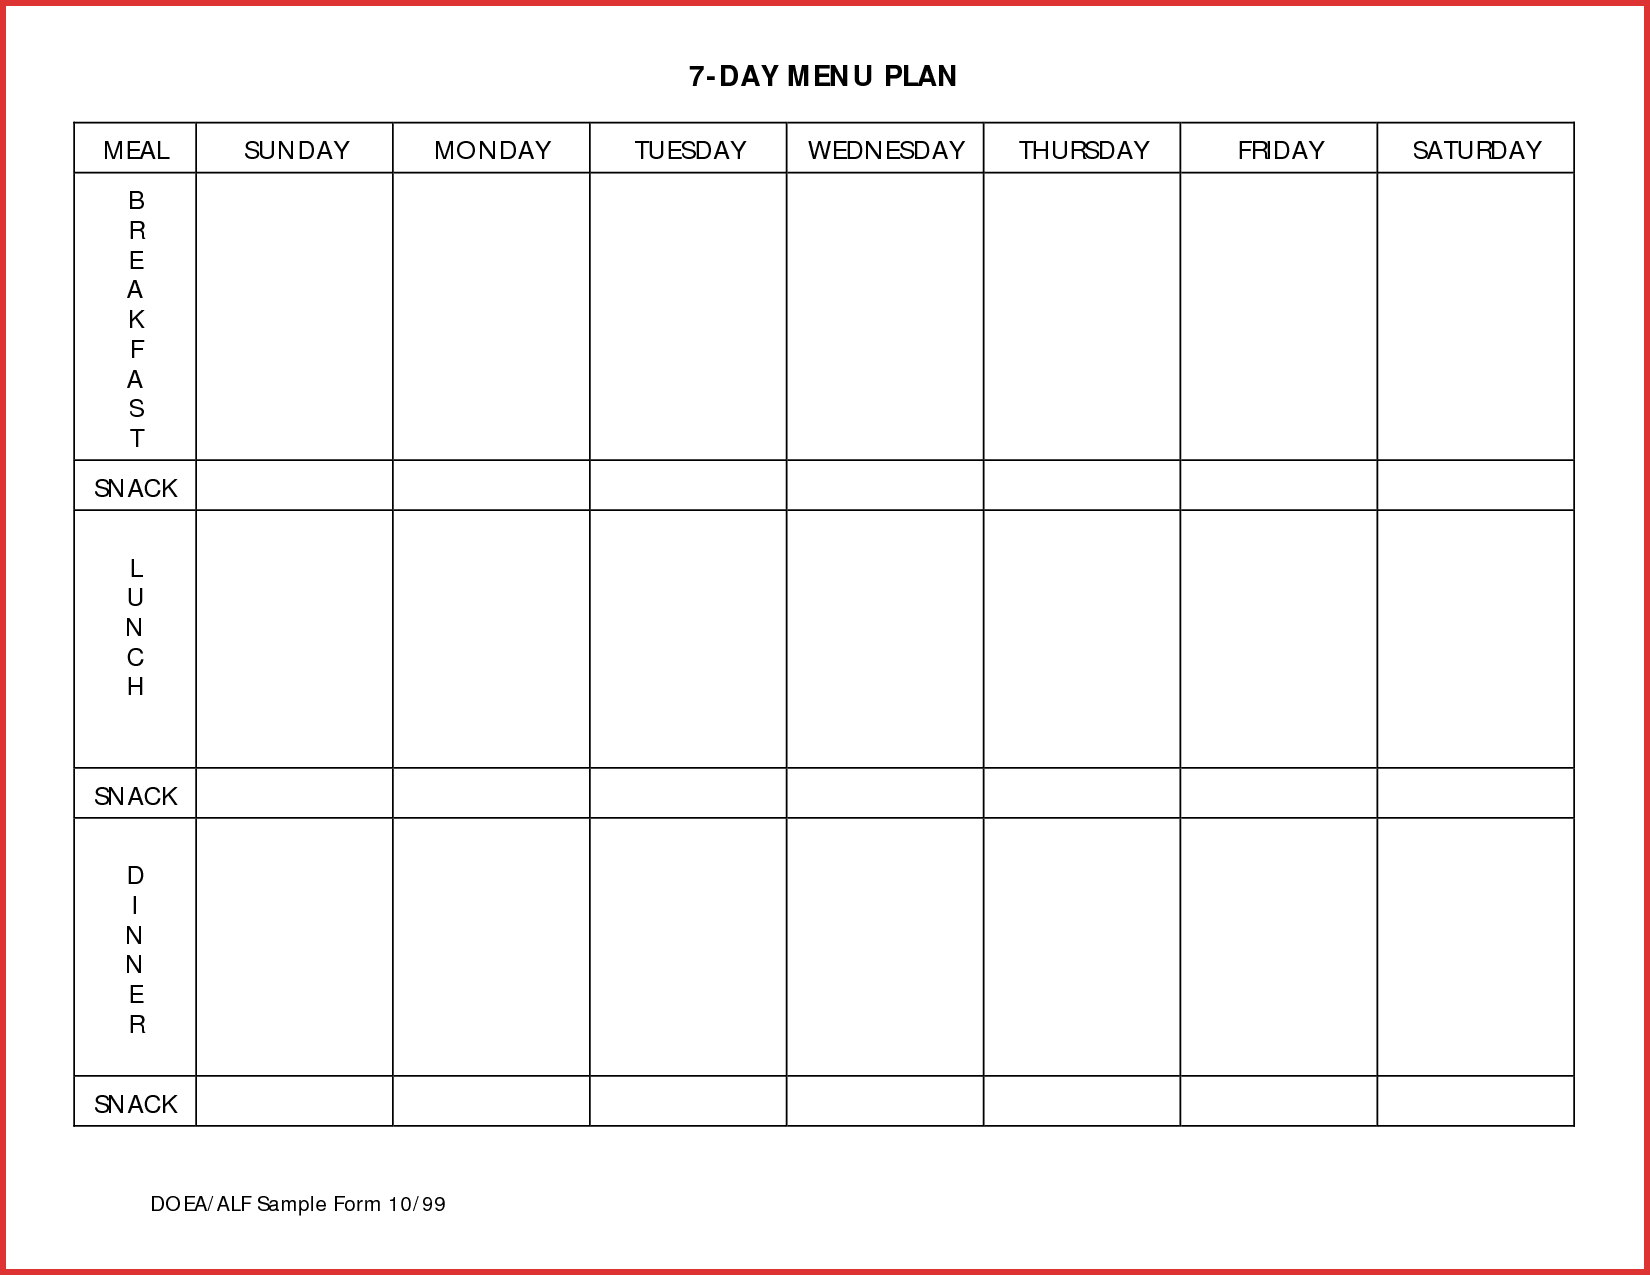 014 Meal Planning Calendar Template Plan Templates Day Menu Planner regarding Printable Calendar Template Week Day Only